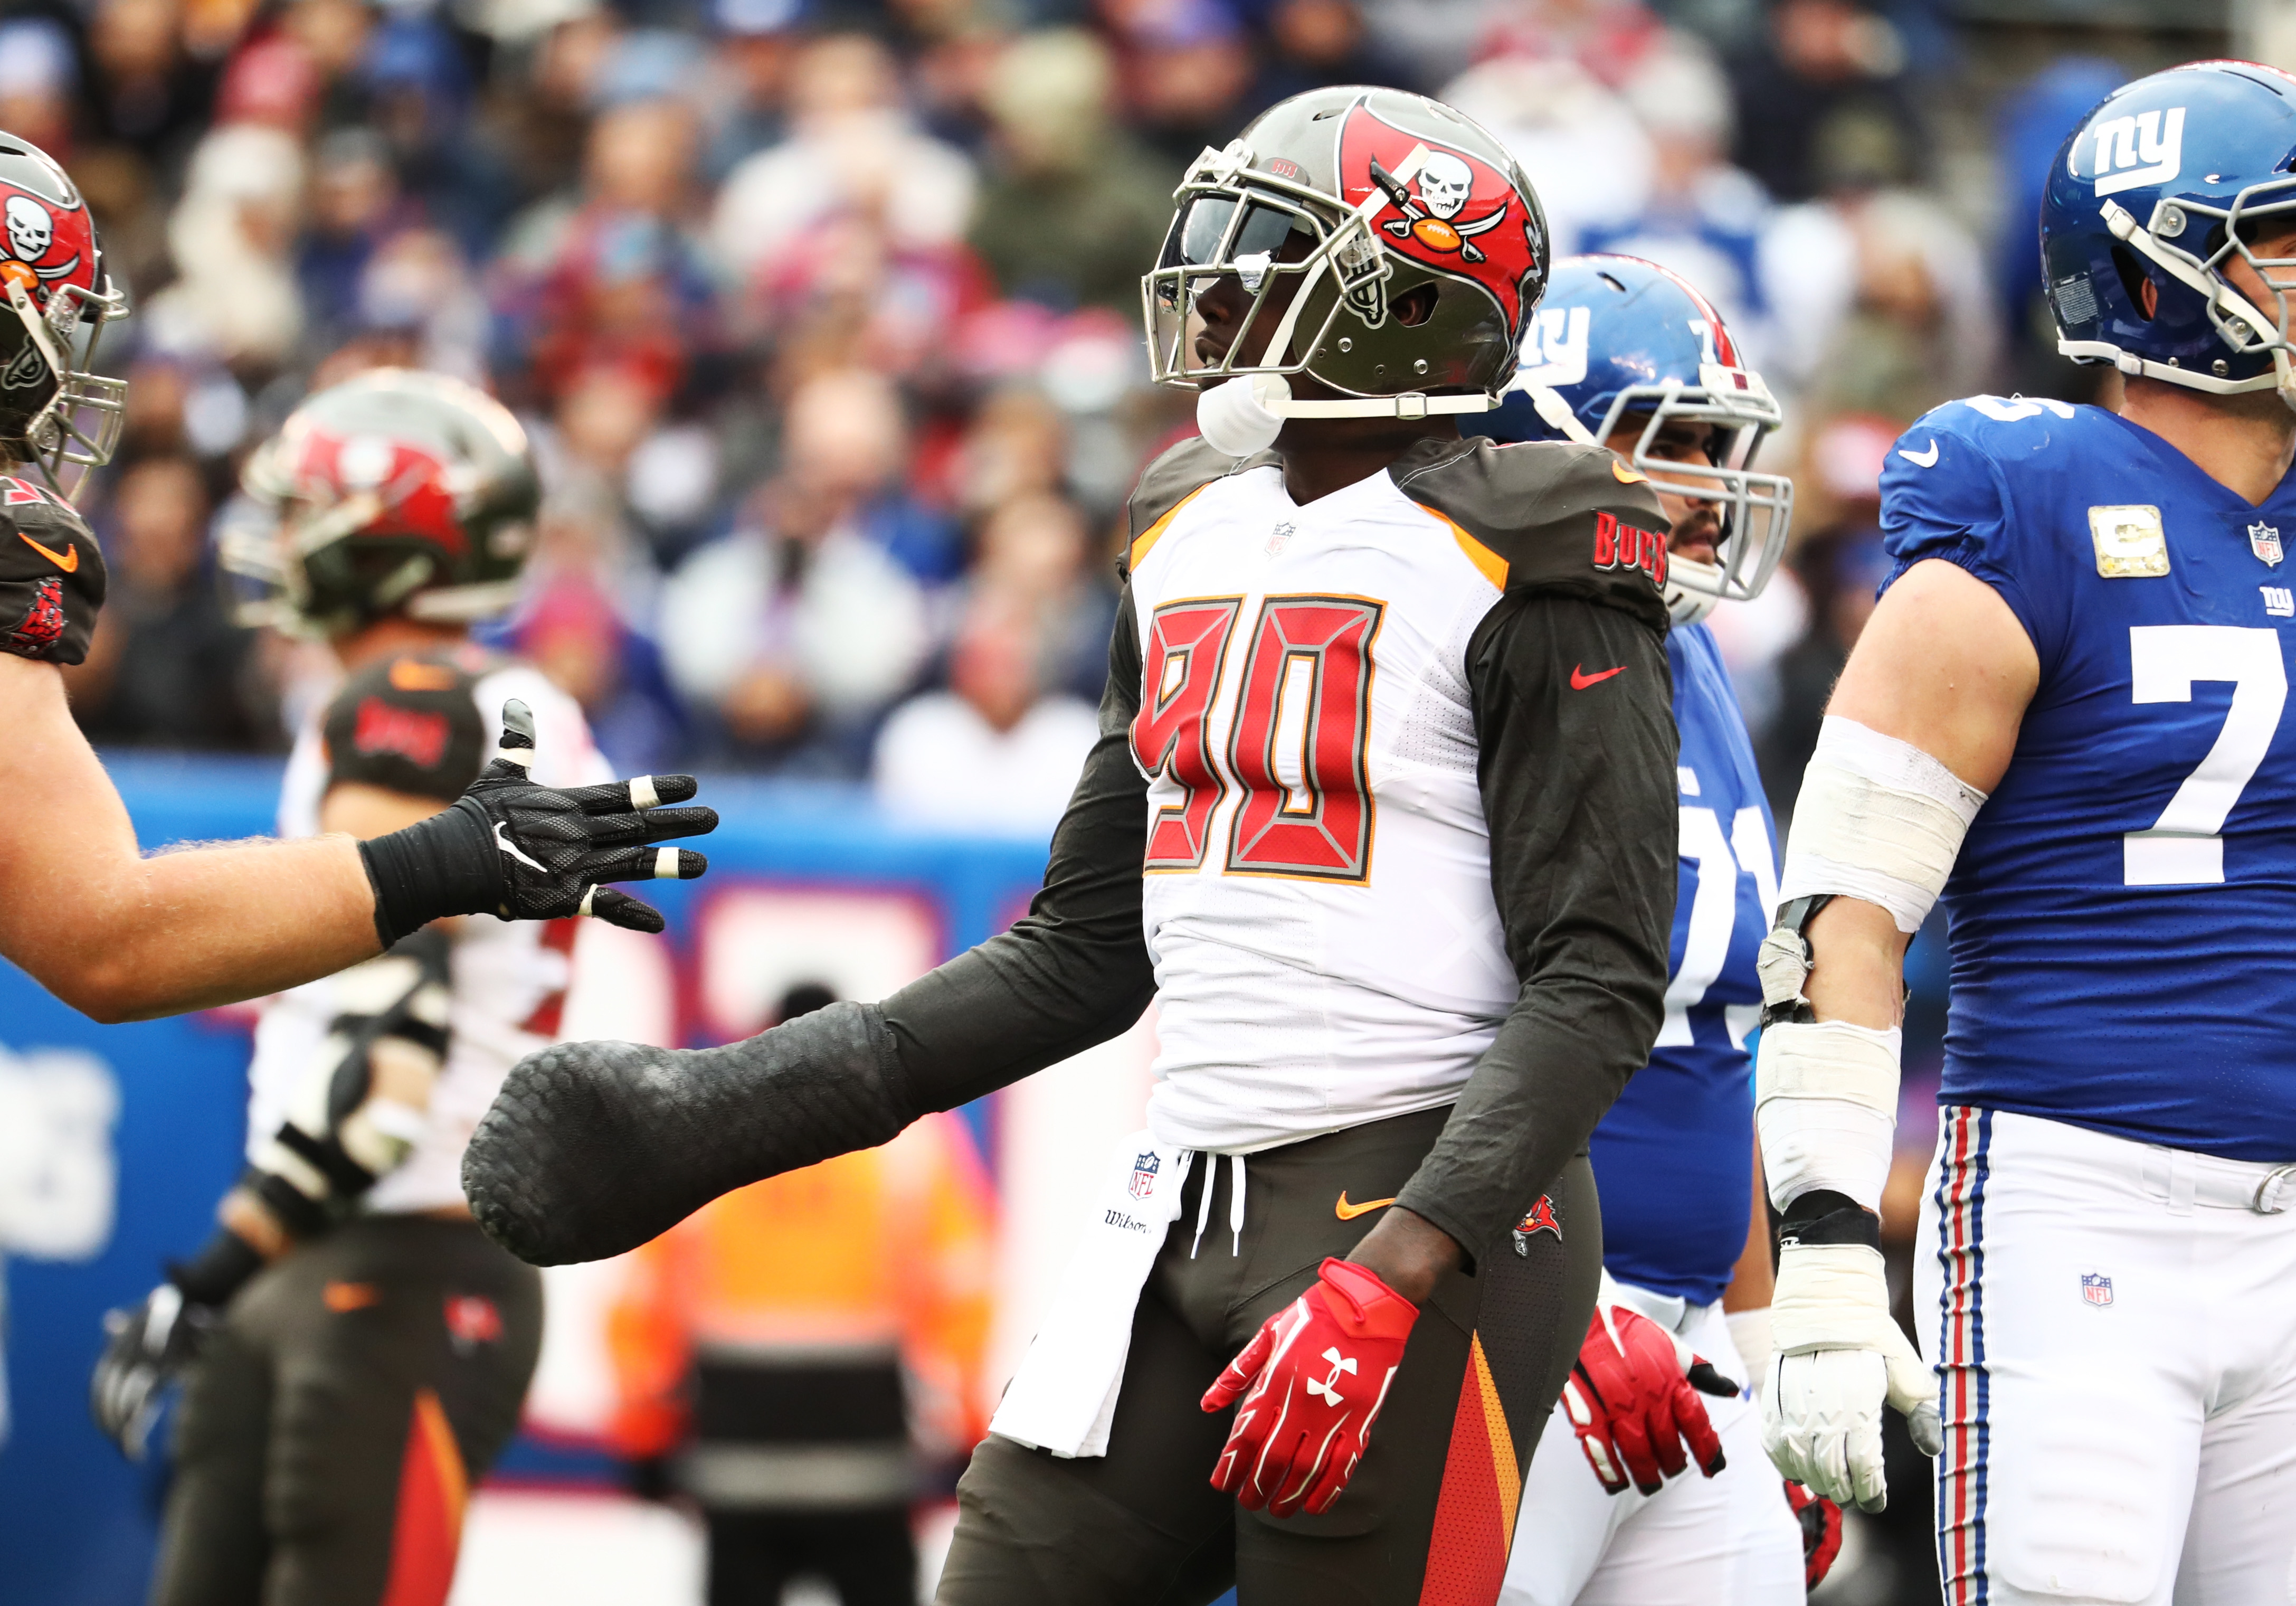 Bucs' Jason Pierre-Paul out to 'destroy' Giants on Monday night